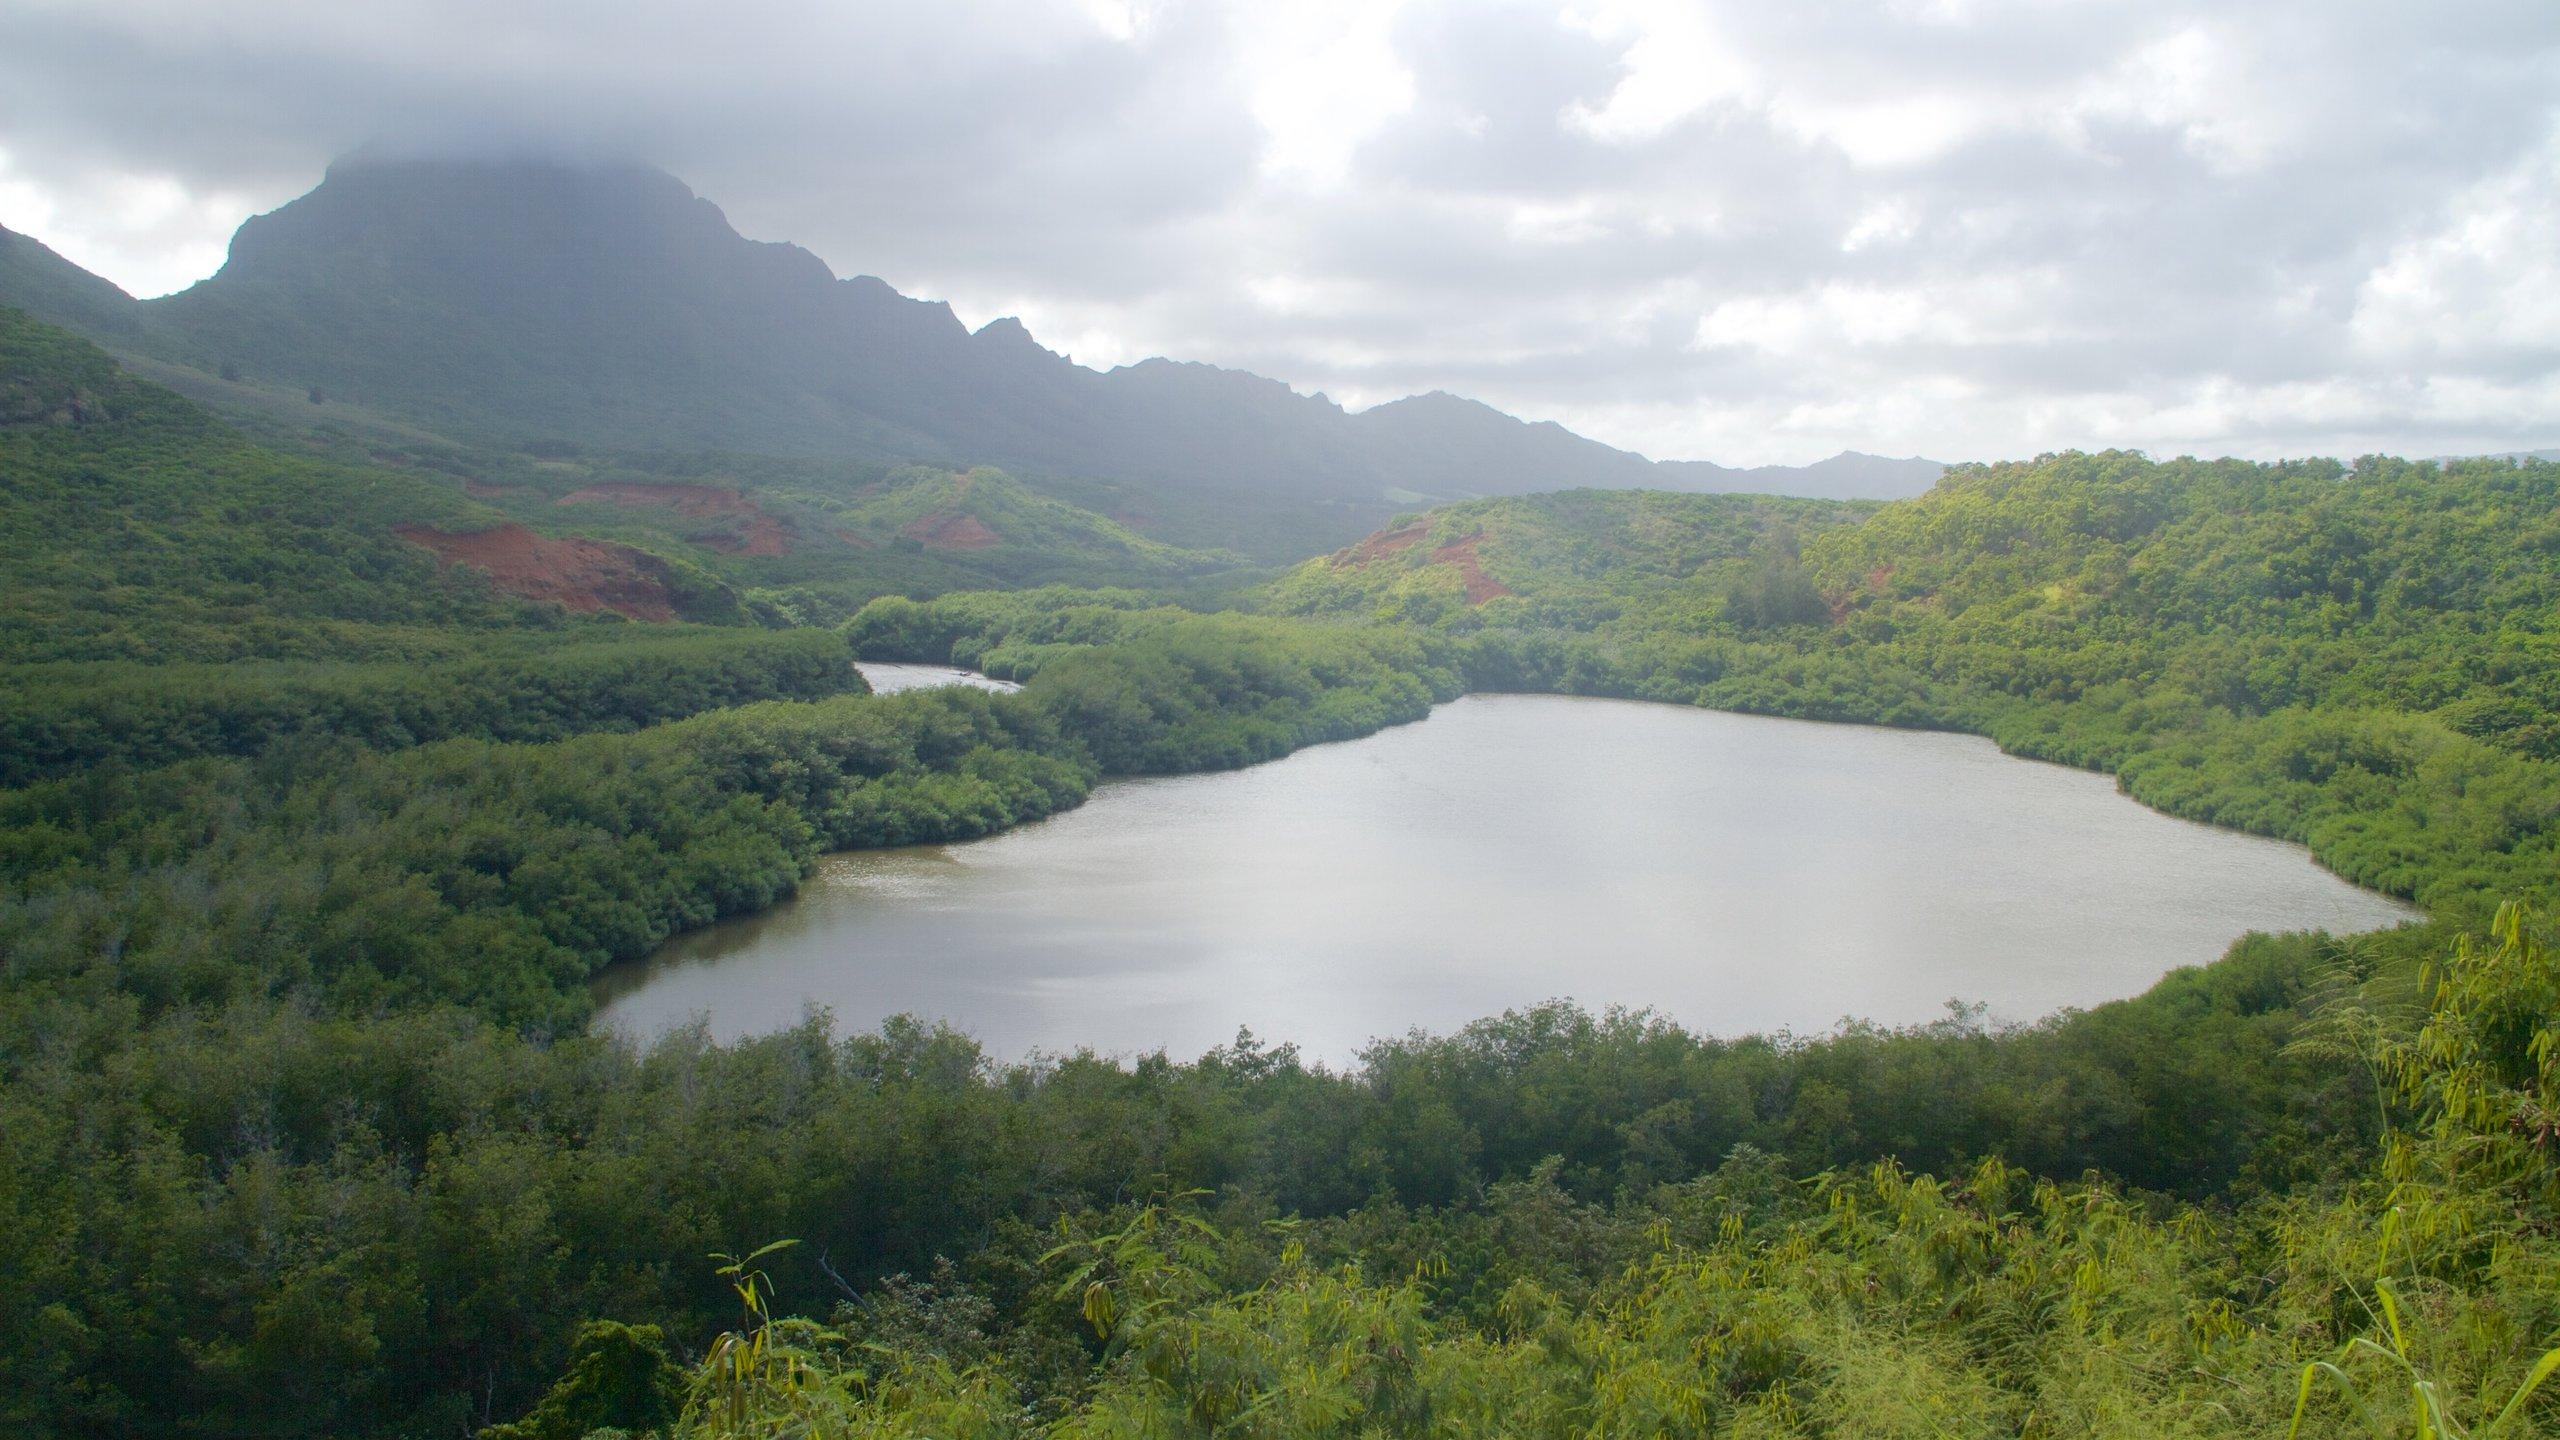 Nawiliwili, Lihue, Hawaii, United States of America